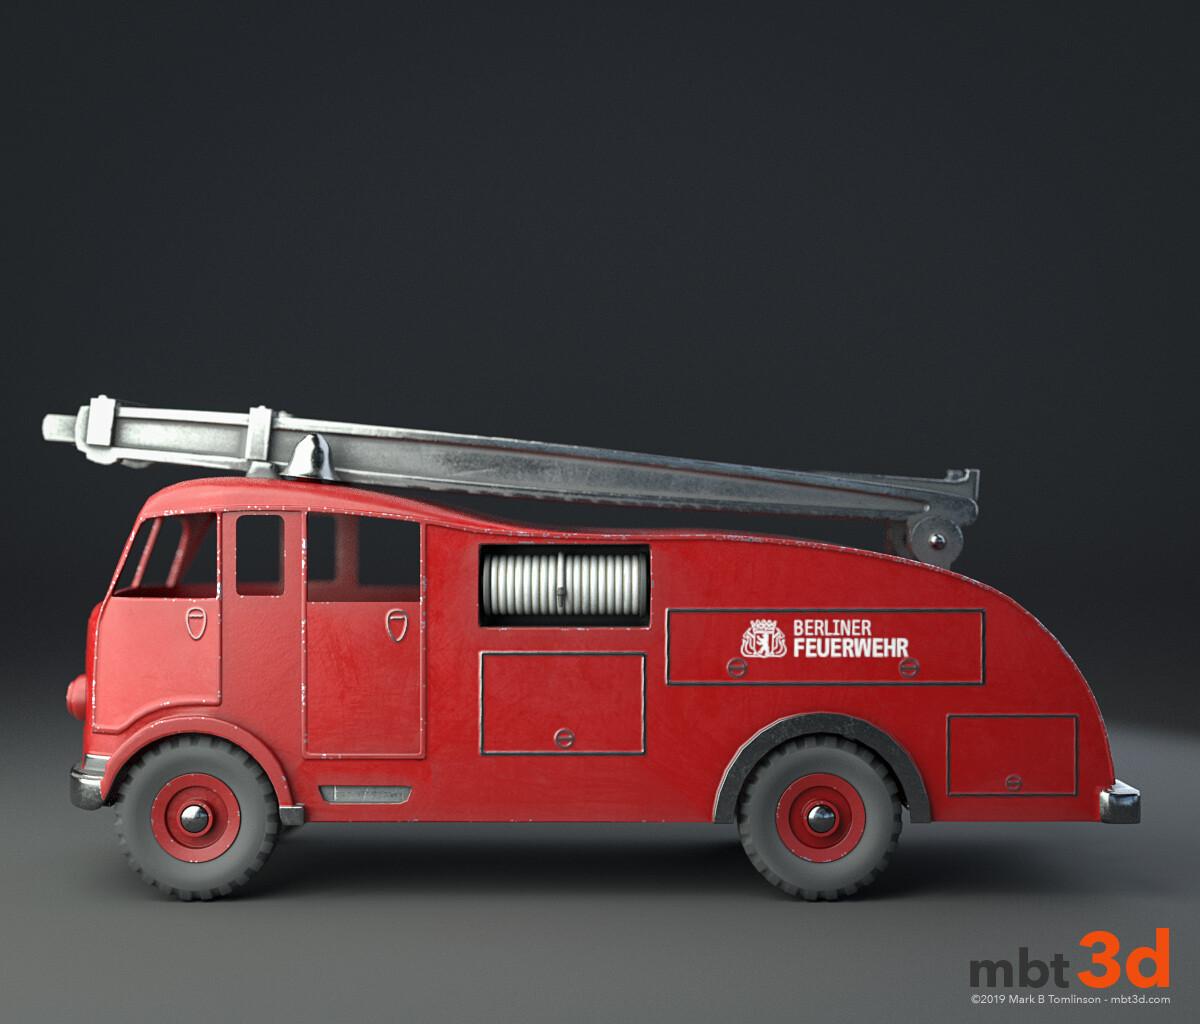 Mark b tomlinson dinky 555 berliner 02